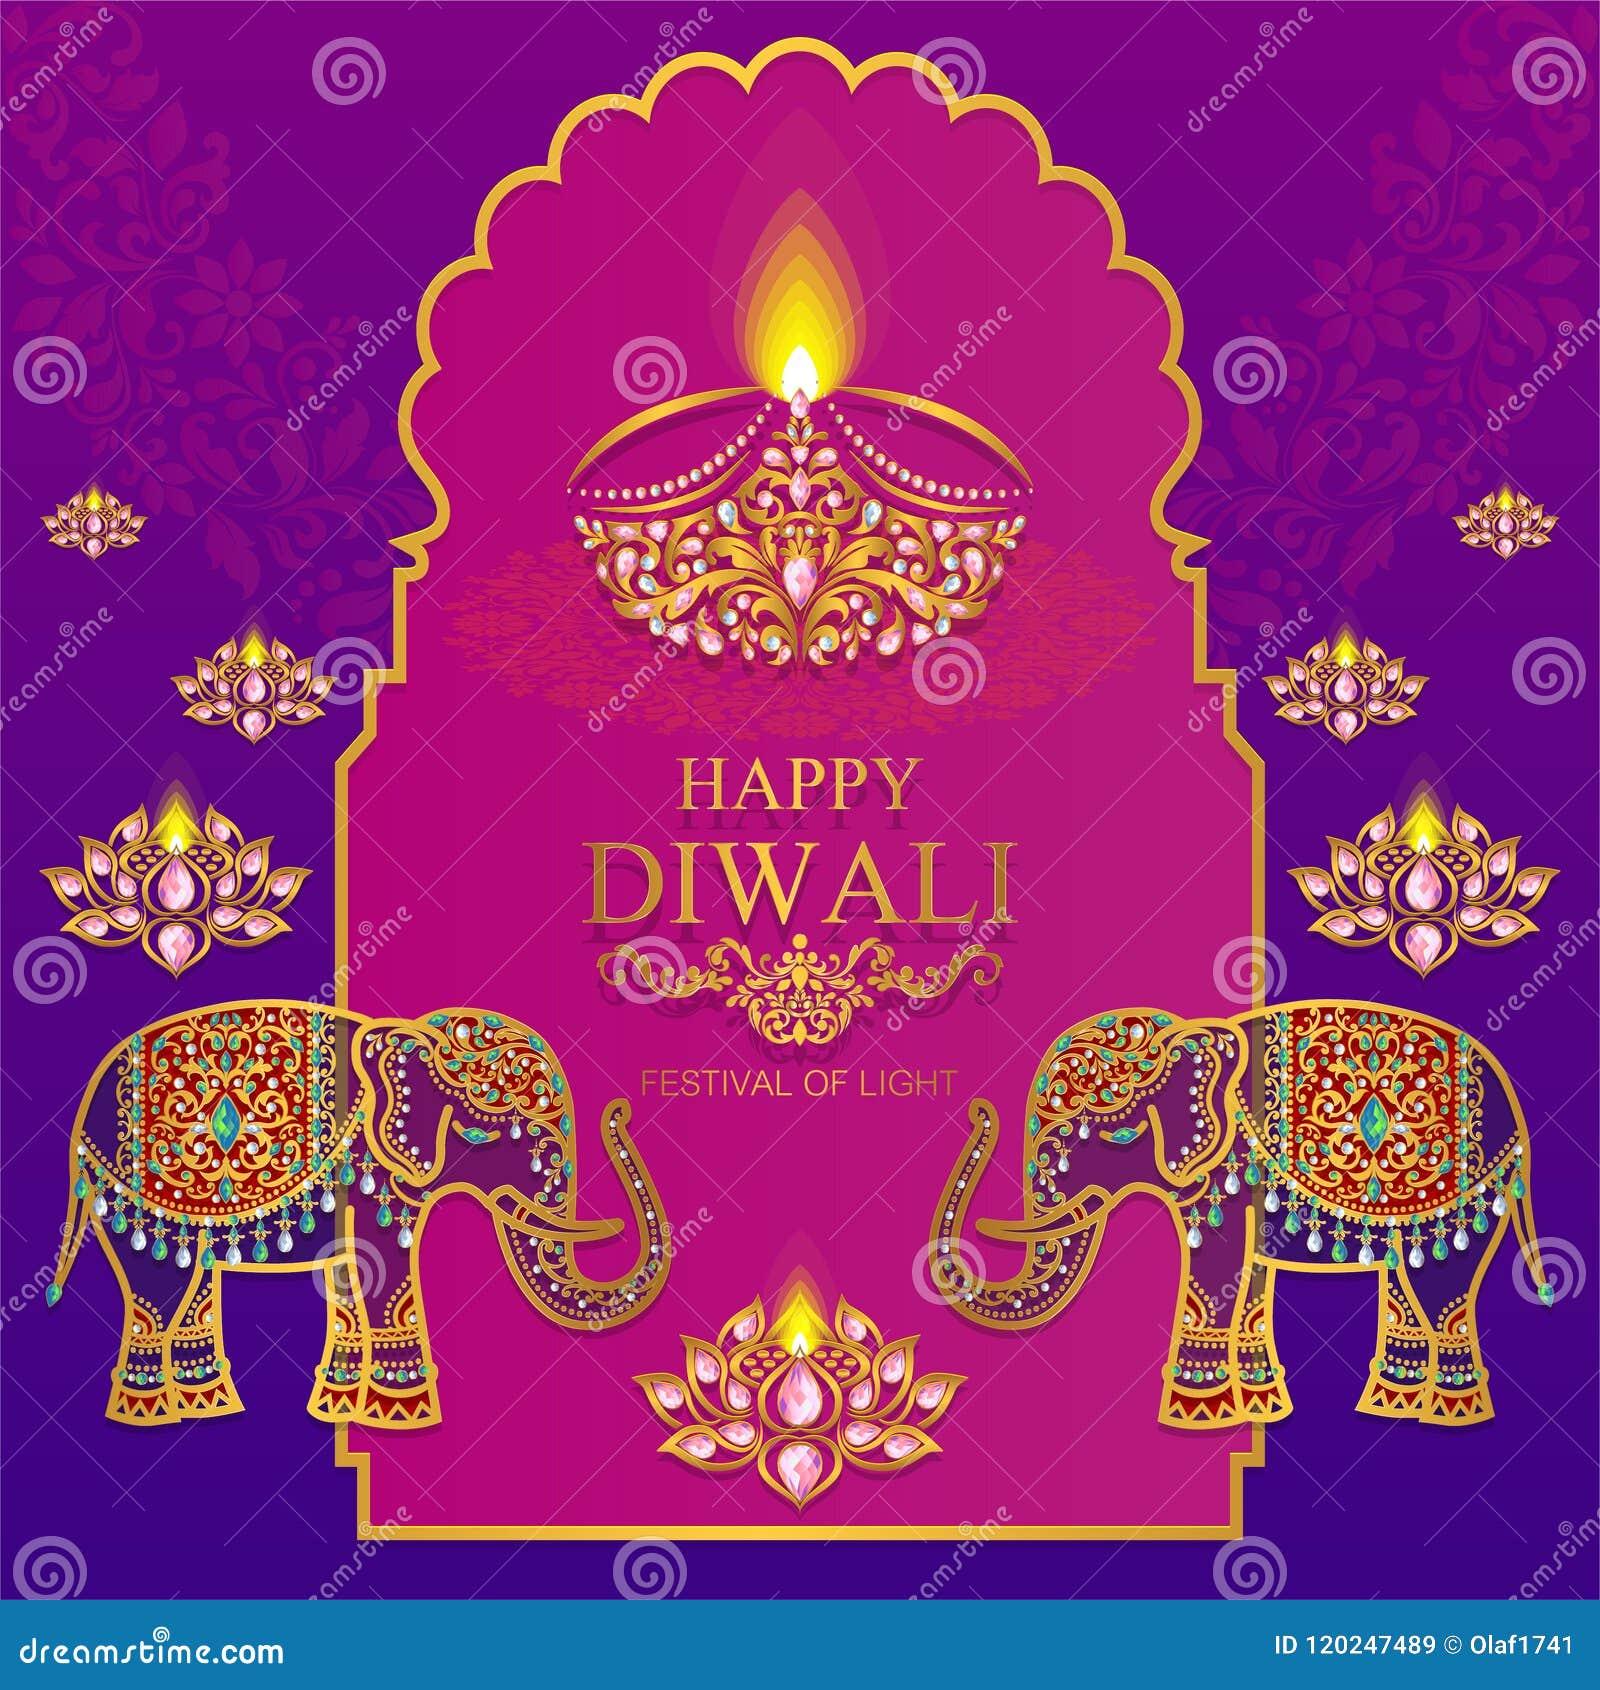 Happy Diwali Festival Card Stock Vector Illustration Of Editable